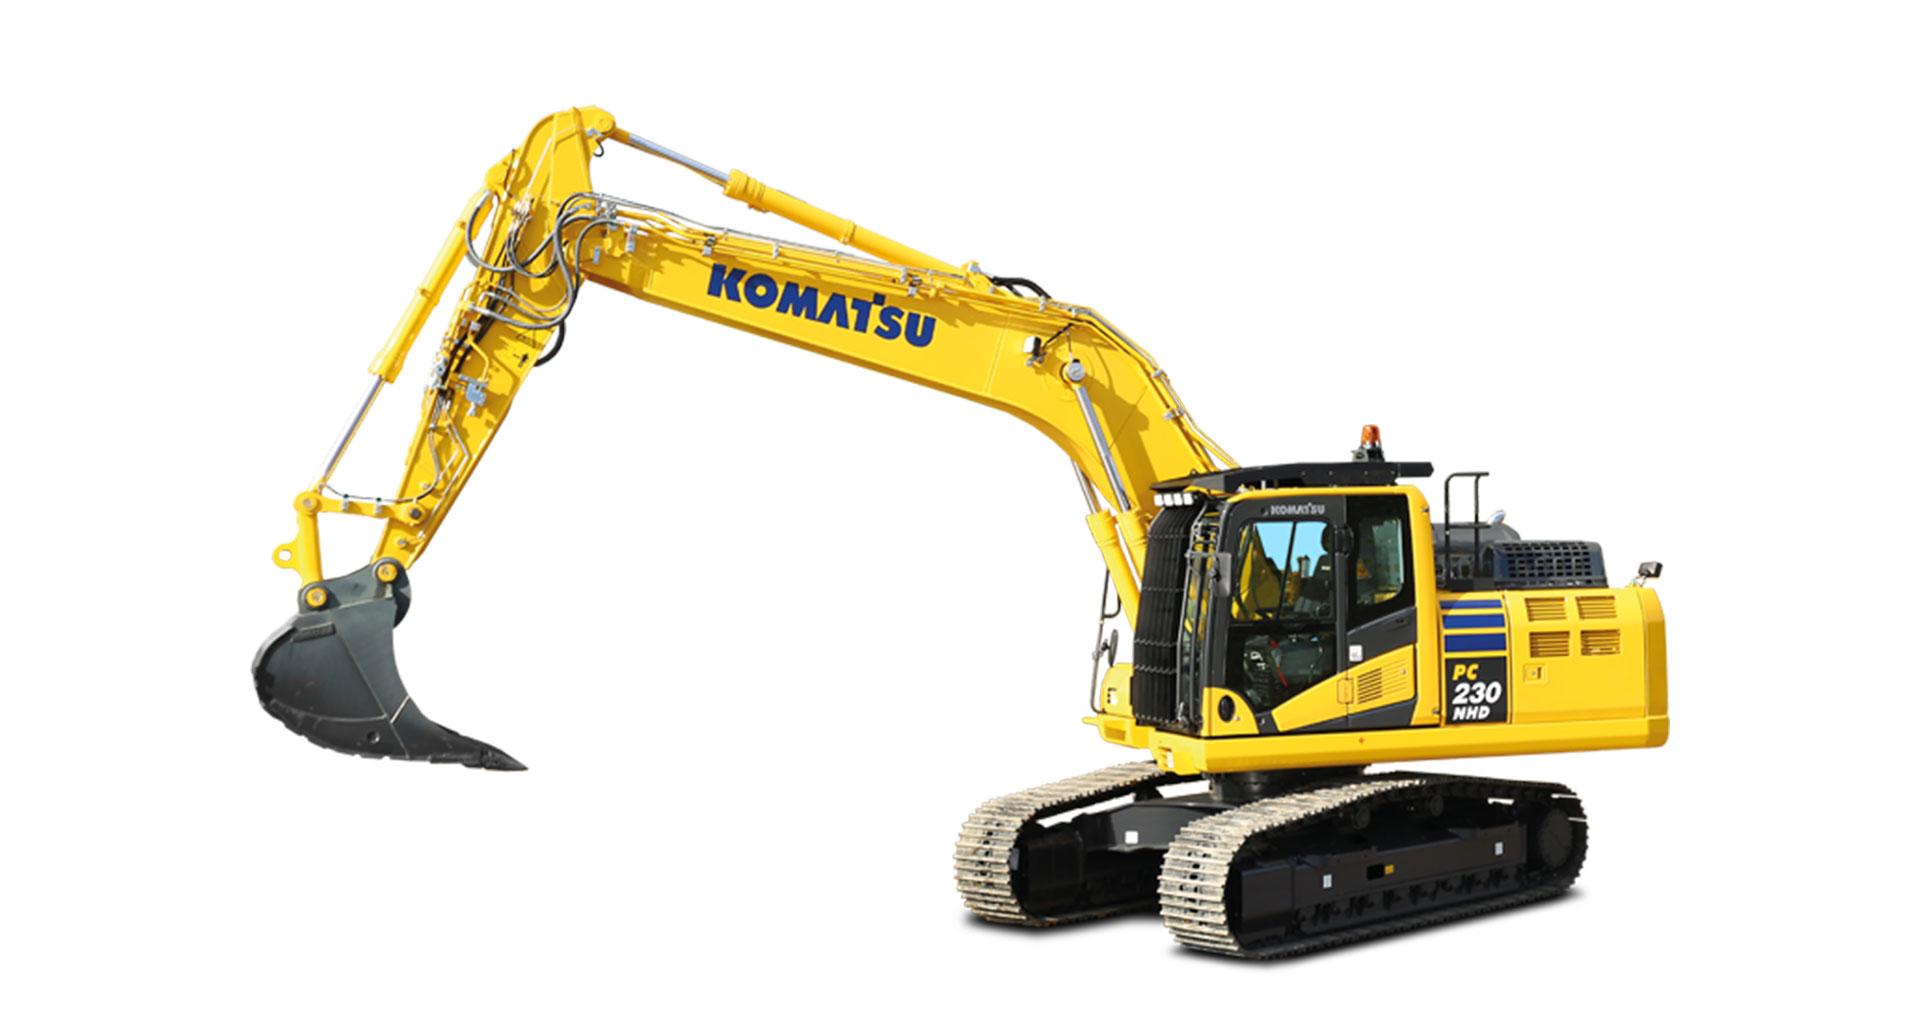 Escavatore cingolato Komatsu PC230NHD-11